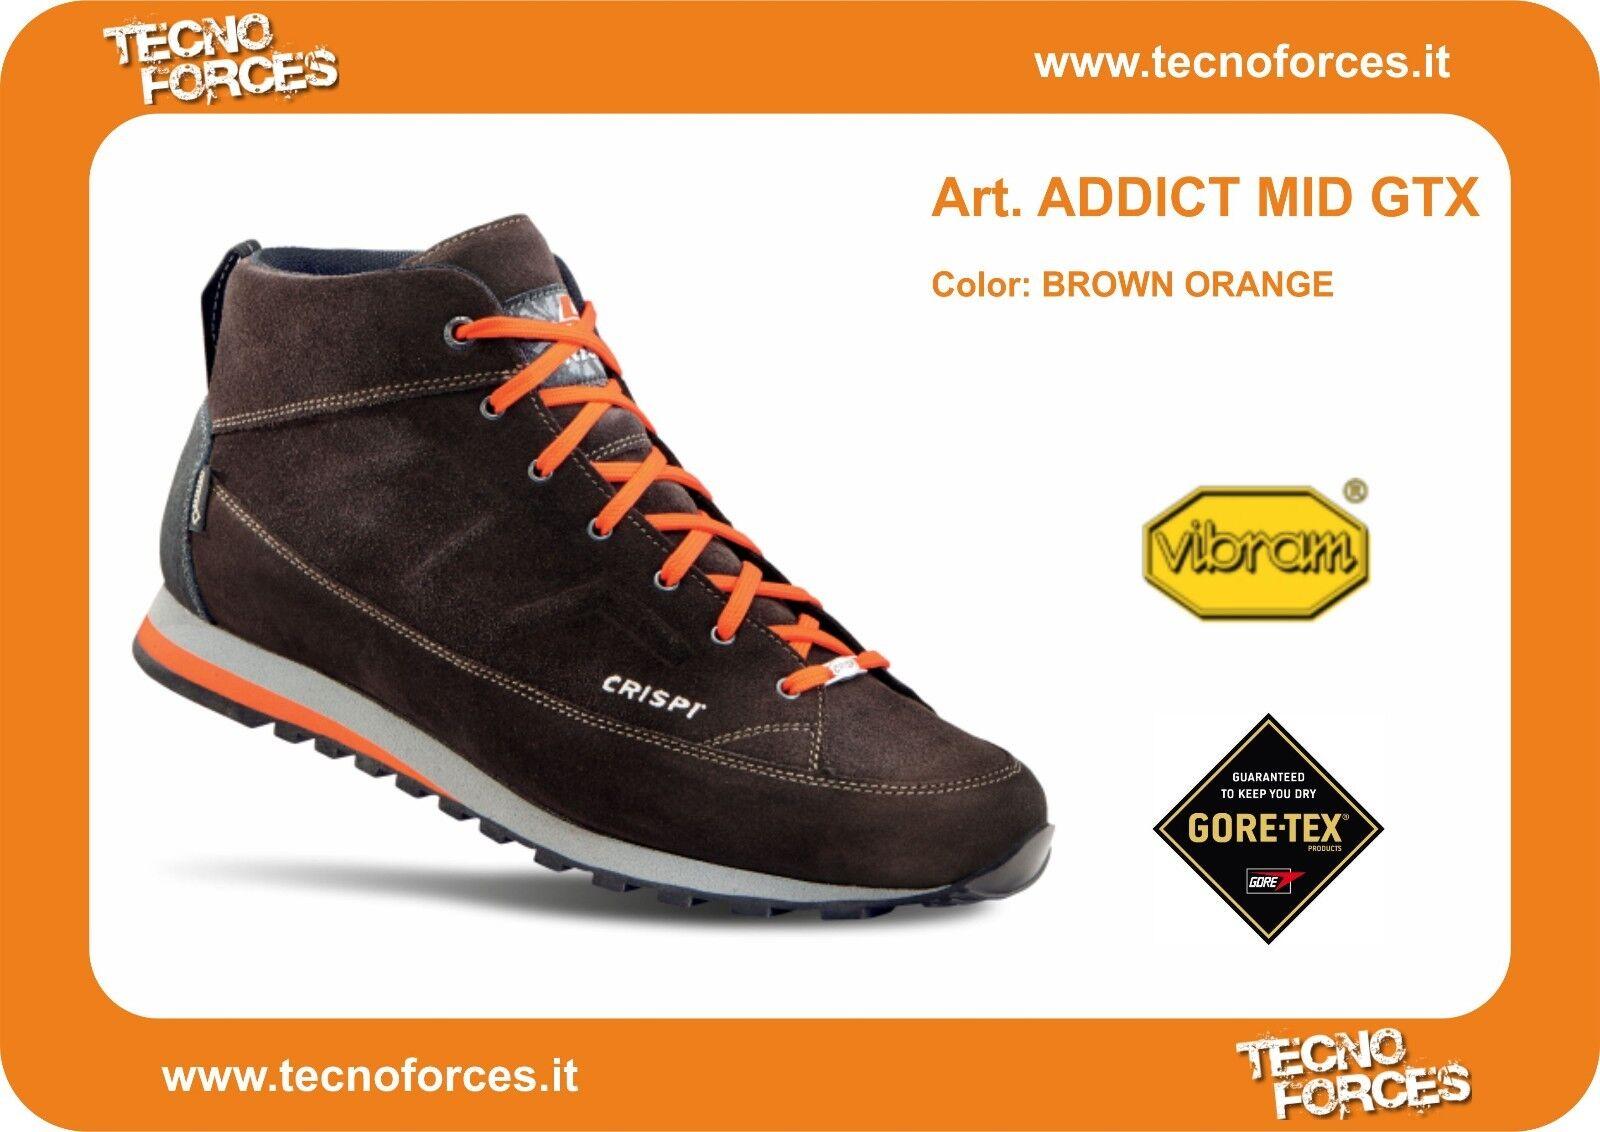 Scarpa Crispi Addict Mid GTX goretex goretex goretex outdoor made in Italy scarpe da ginnastica c2aa8b